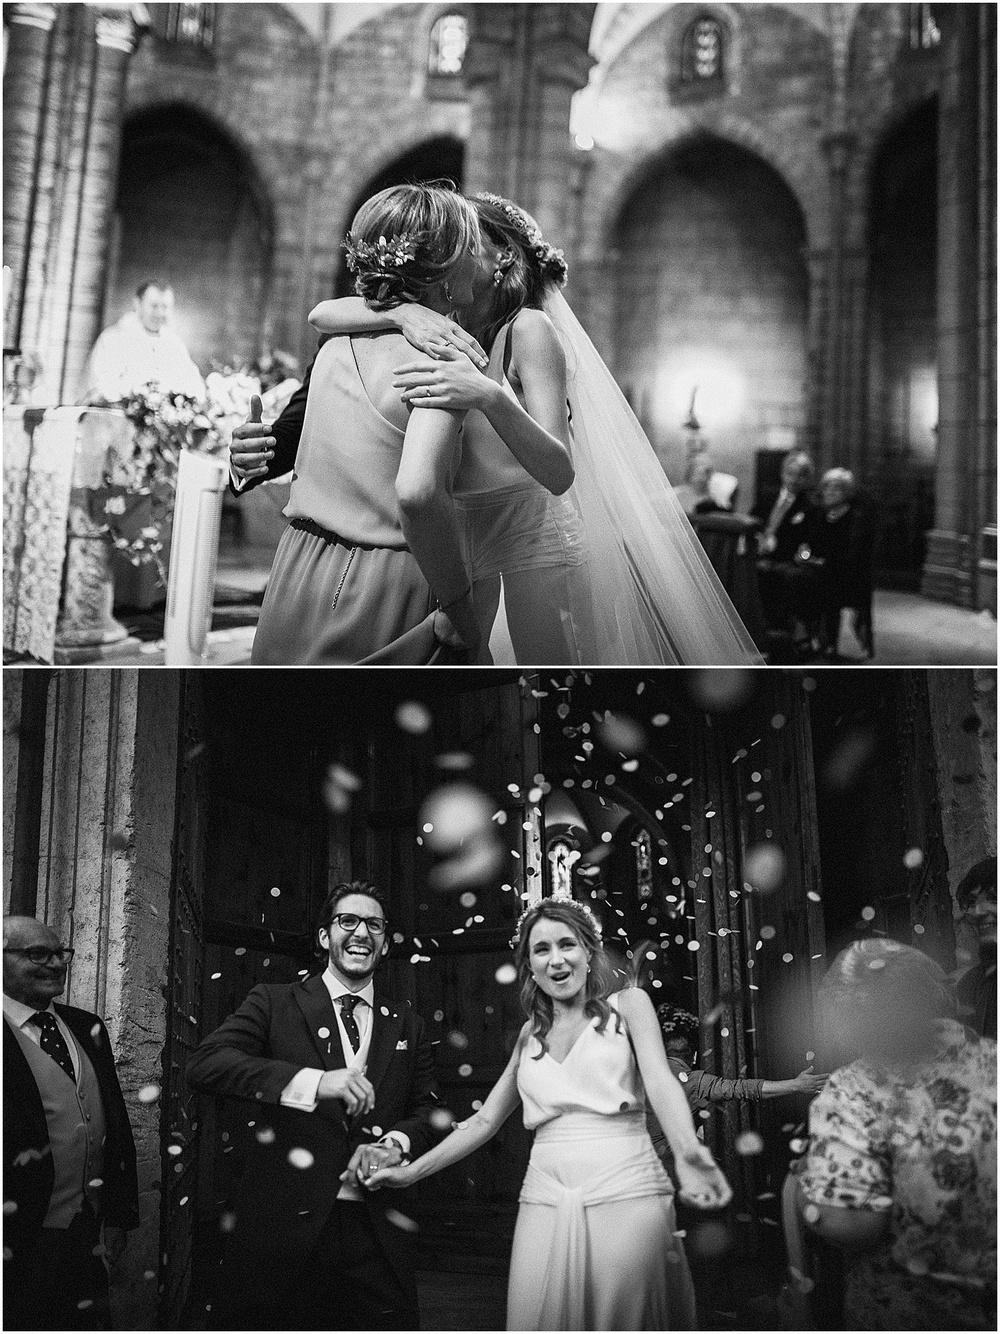 Macarena y Jordi - boda en valencia - Pablo Laguia (18).jpg